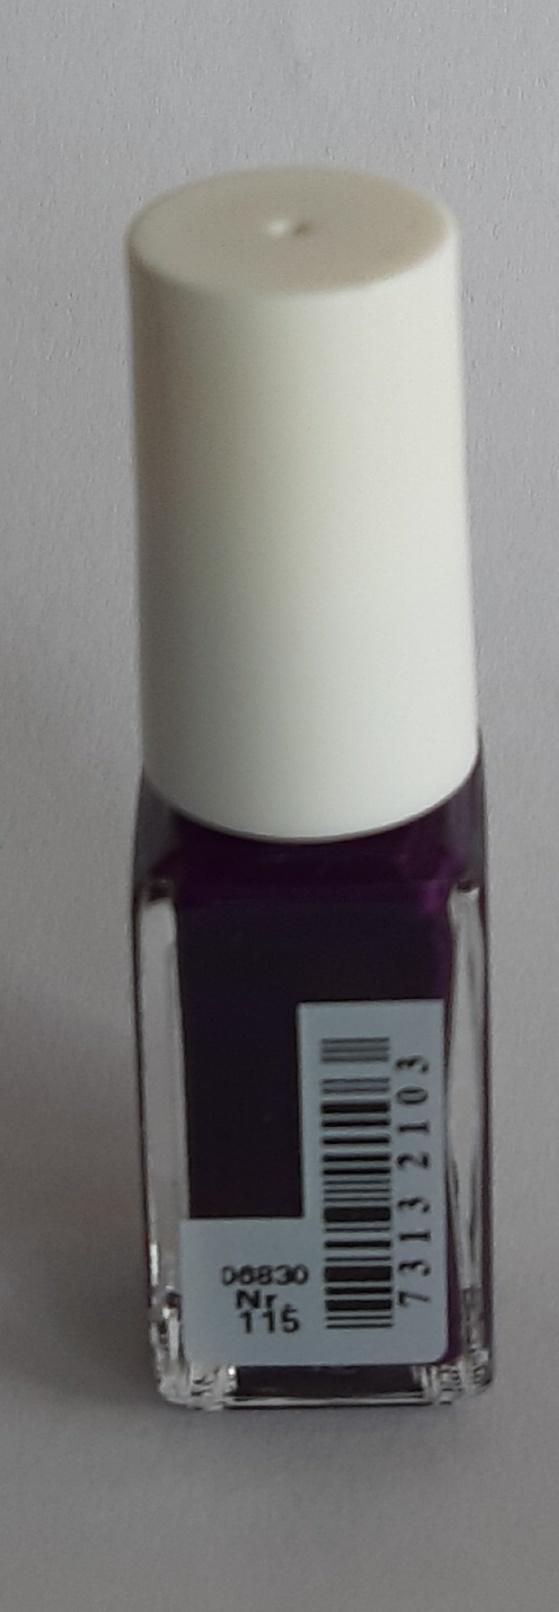 Mykored Anti-Voetschimmel en O2 Depend Nagellak Nagellak O2 Depend zuurstof doorlatend nr. 115 donker paars